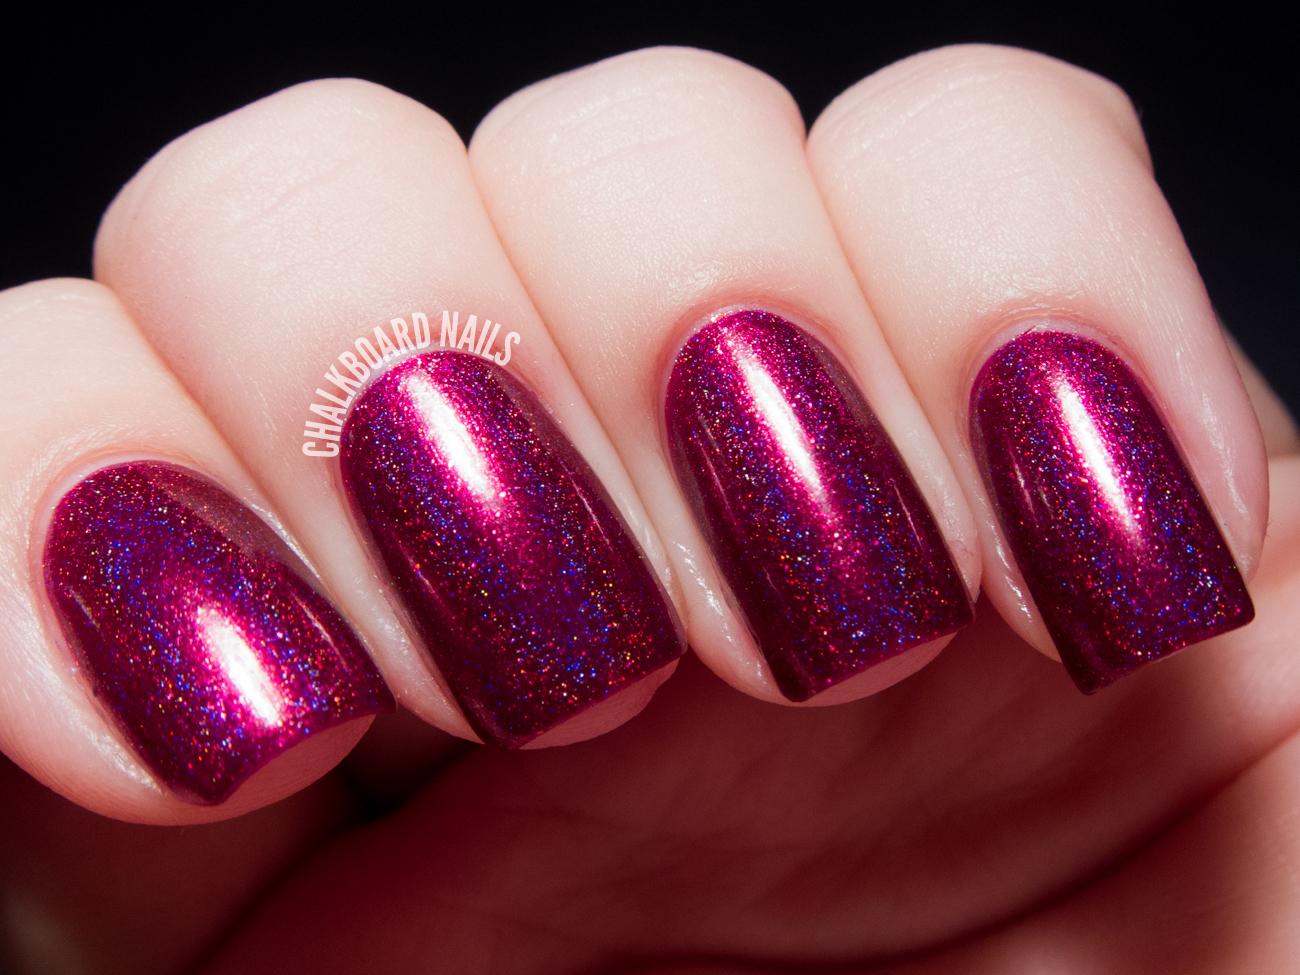 I Love Nail Polish A.C. Slater and Molly Swatches | Chalkboard Nails ...